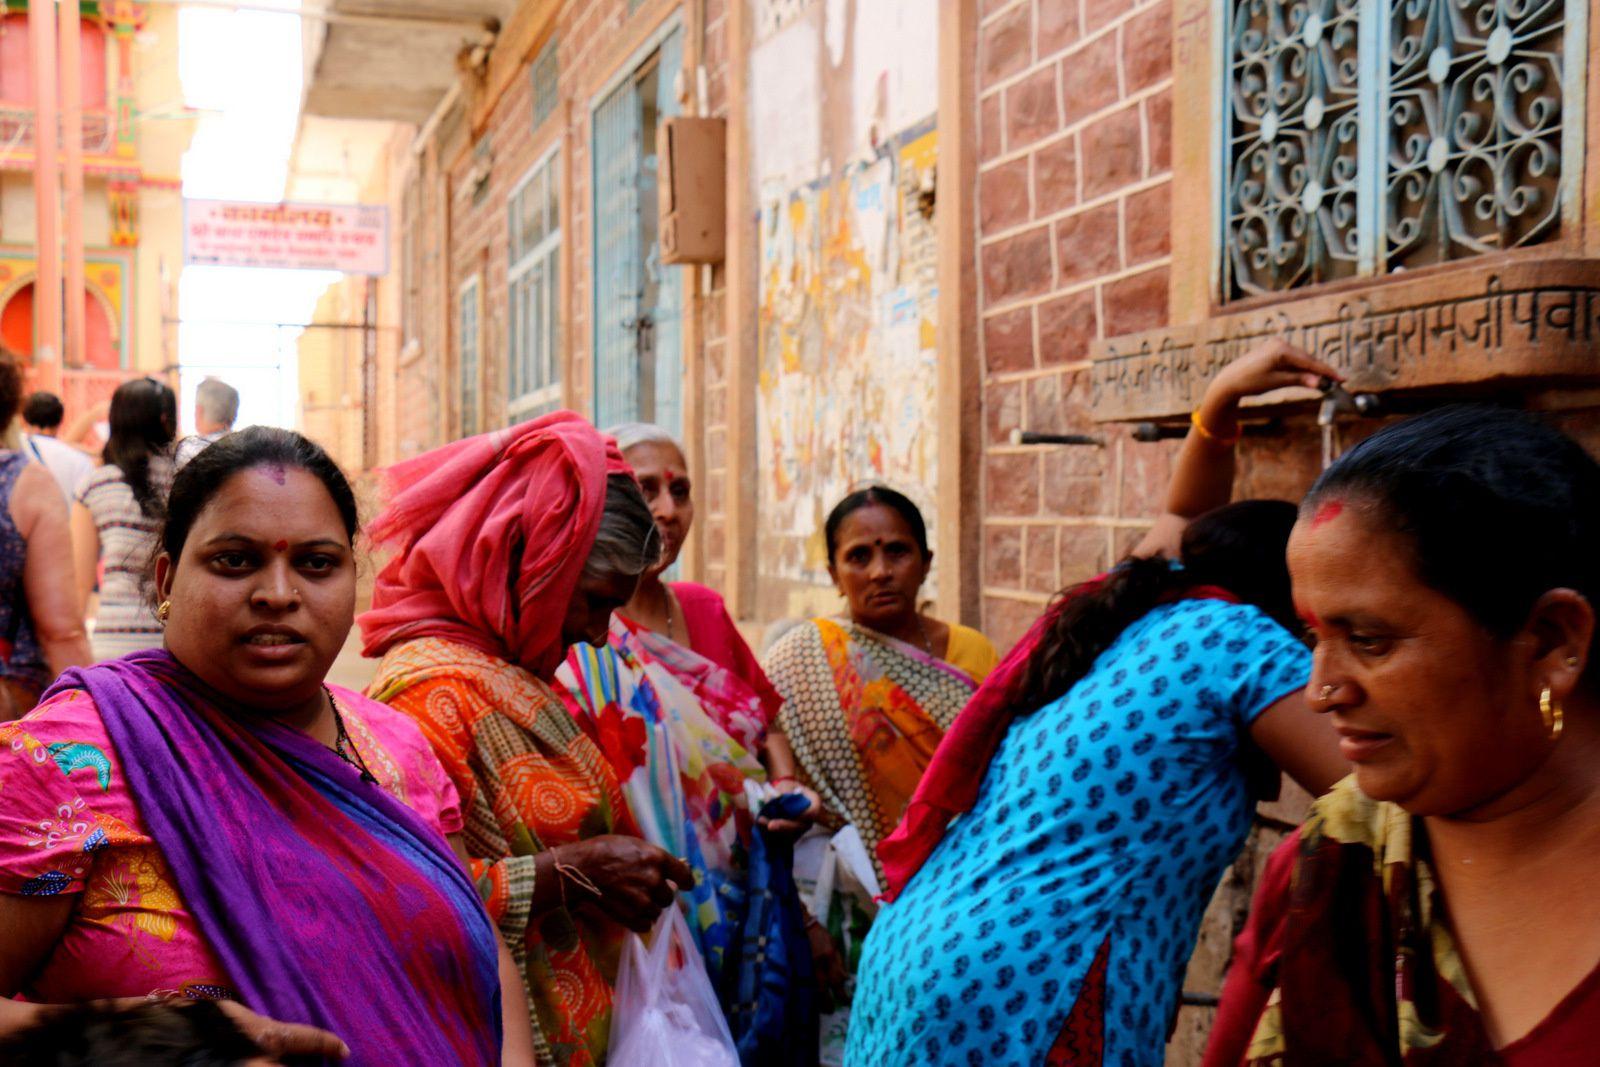 Sur la route entre Bikaner et Jaisalmer, Rajasthan (Inde)